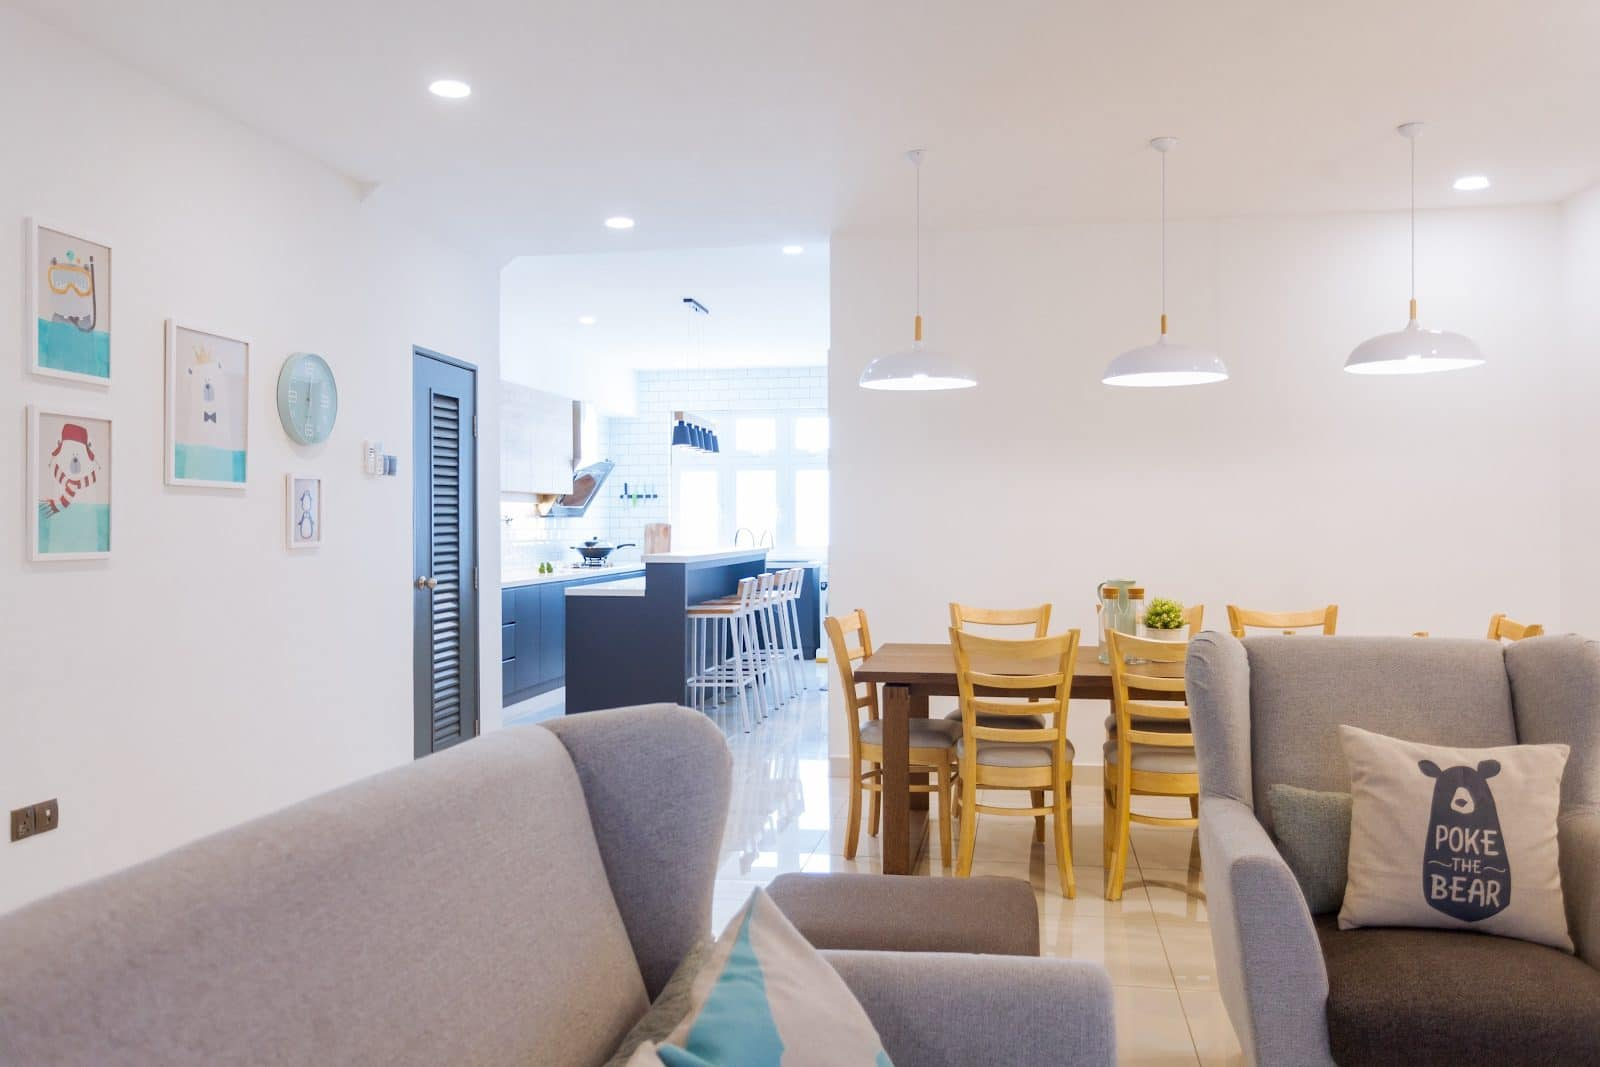 Konsep ruang terbuka dengan ruang tamu dan meja makan gaya moden